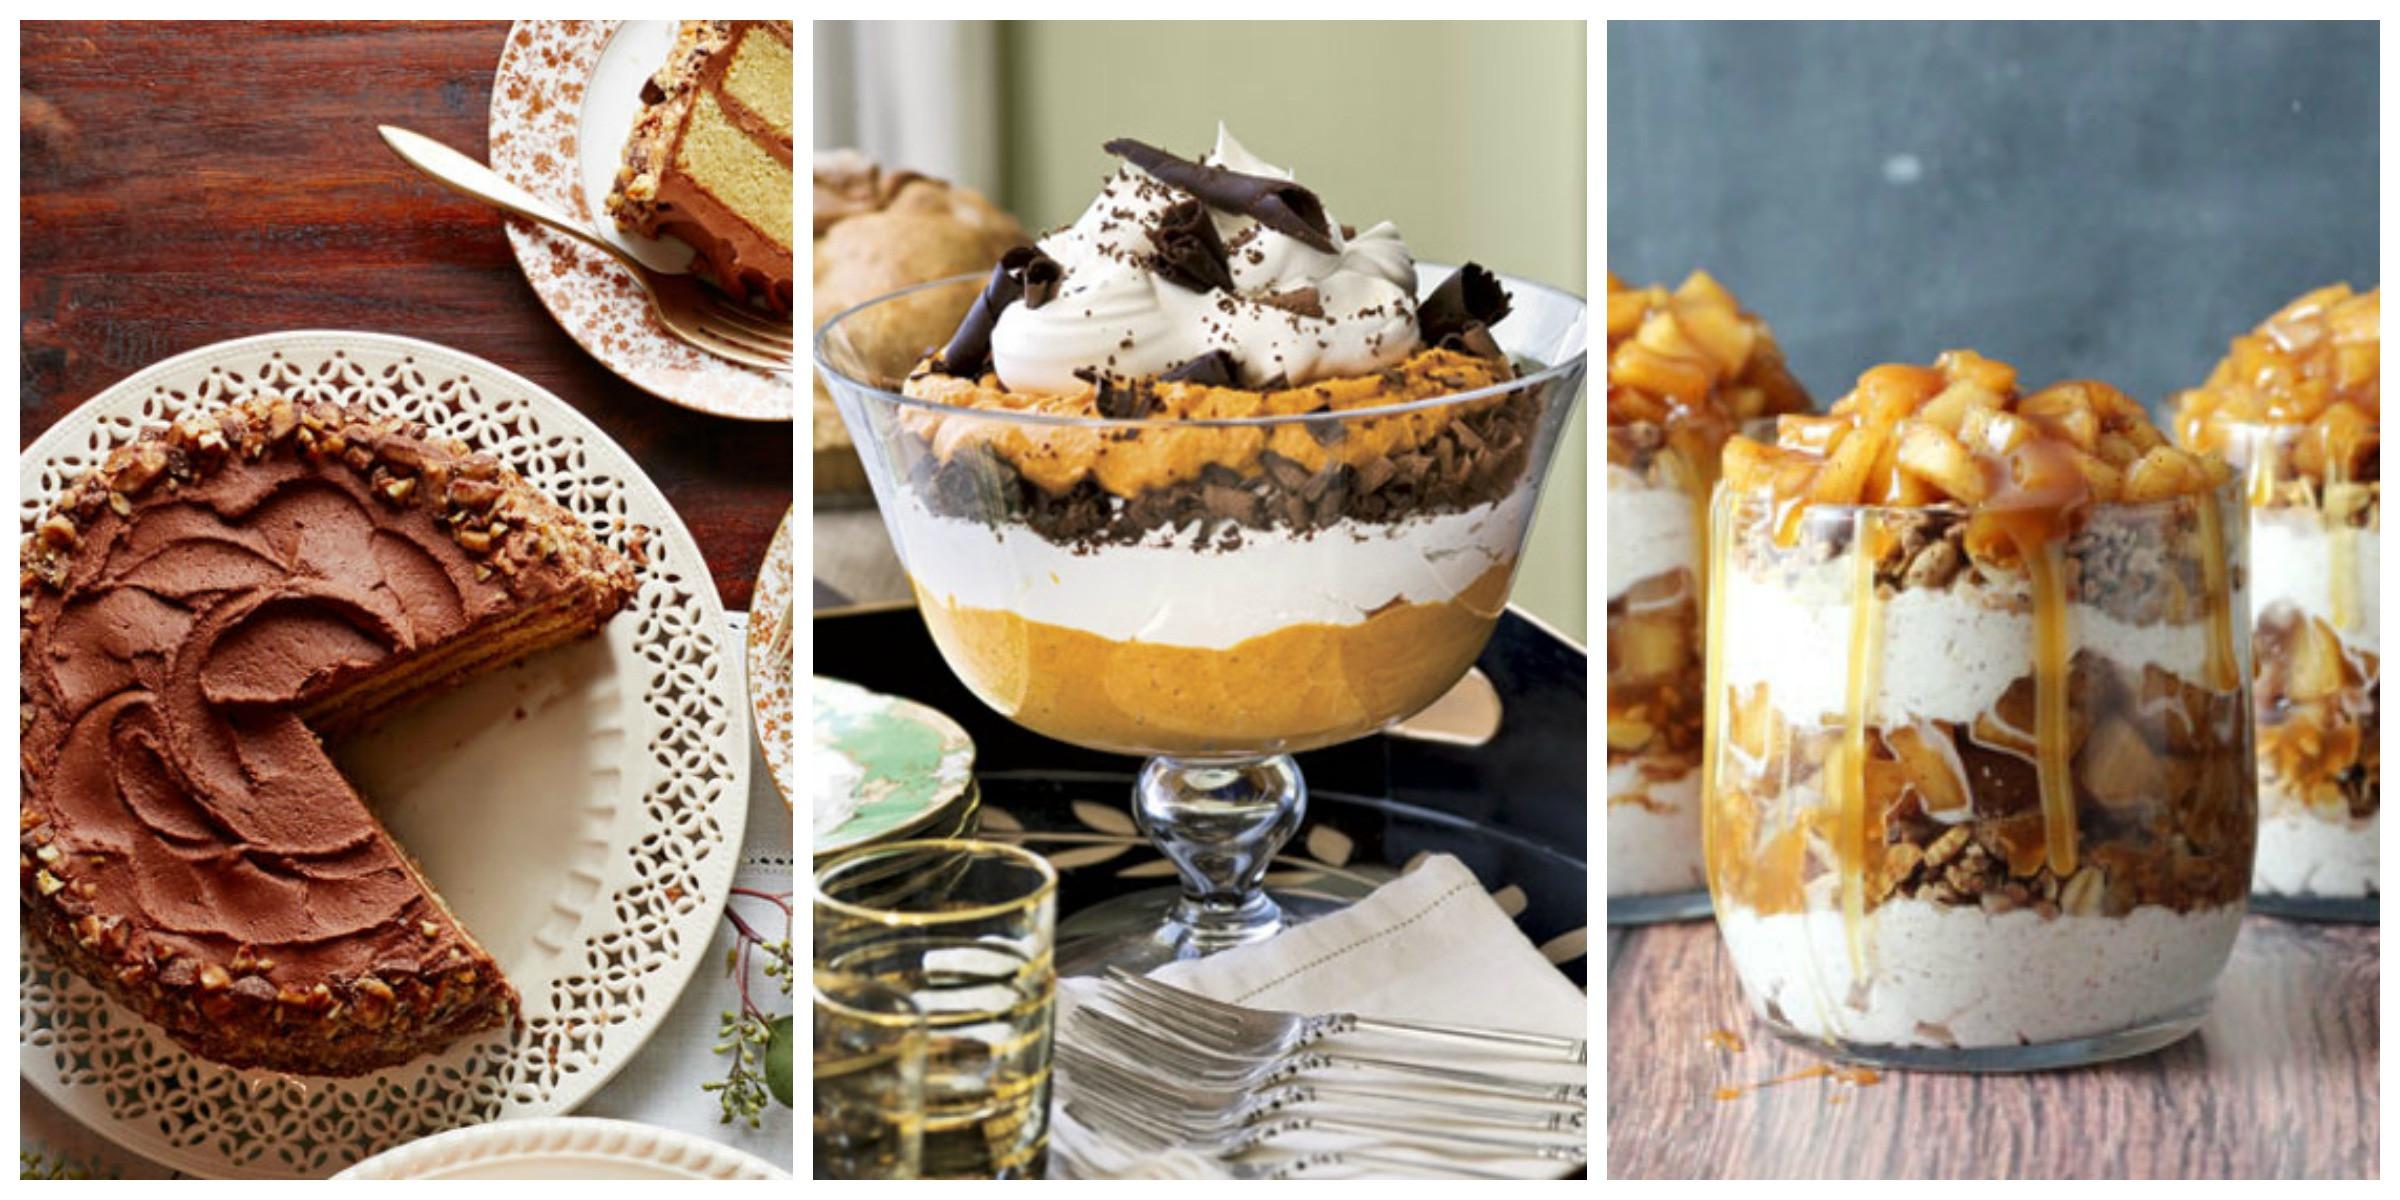 Thanksgiving Desserts Ideas  40 Easy Thanksgiving Desserts Recipes Best Ideas for